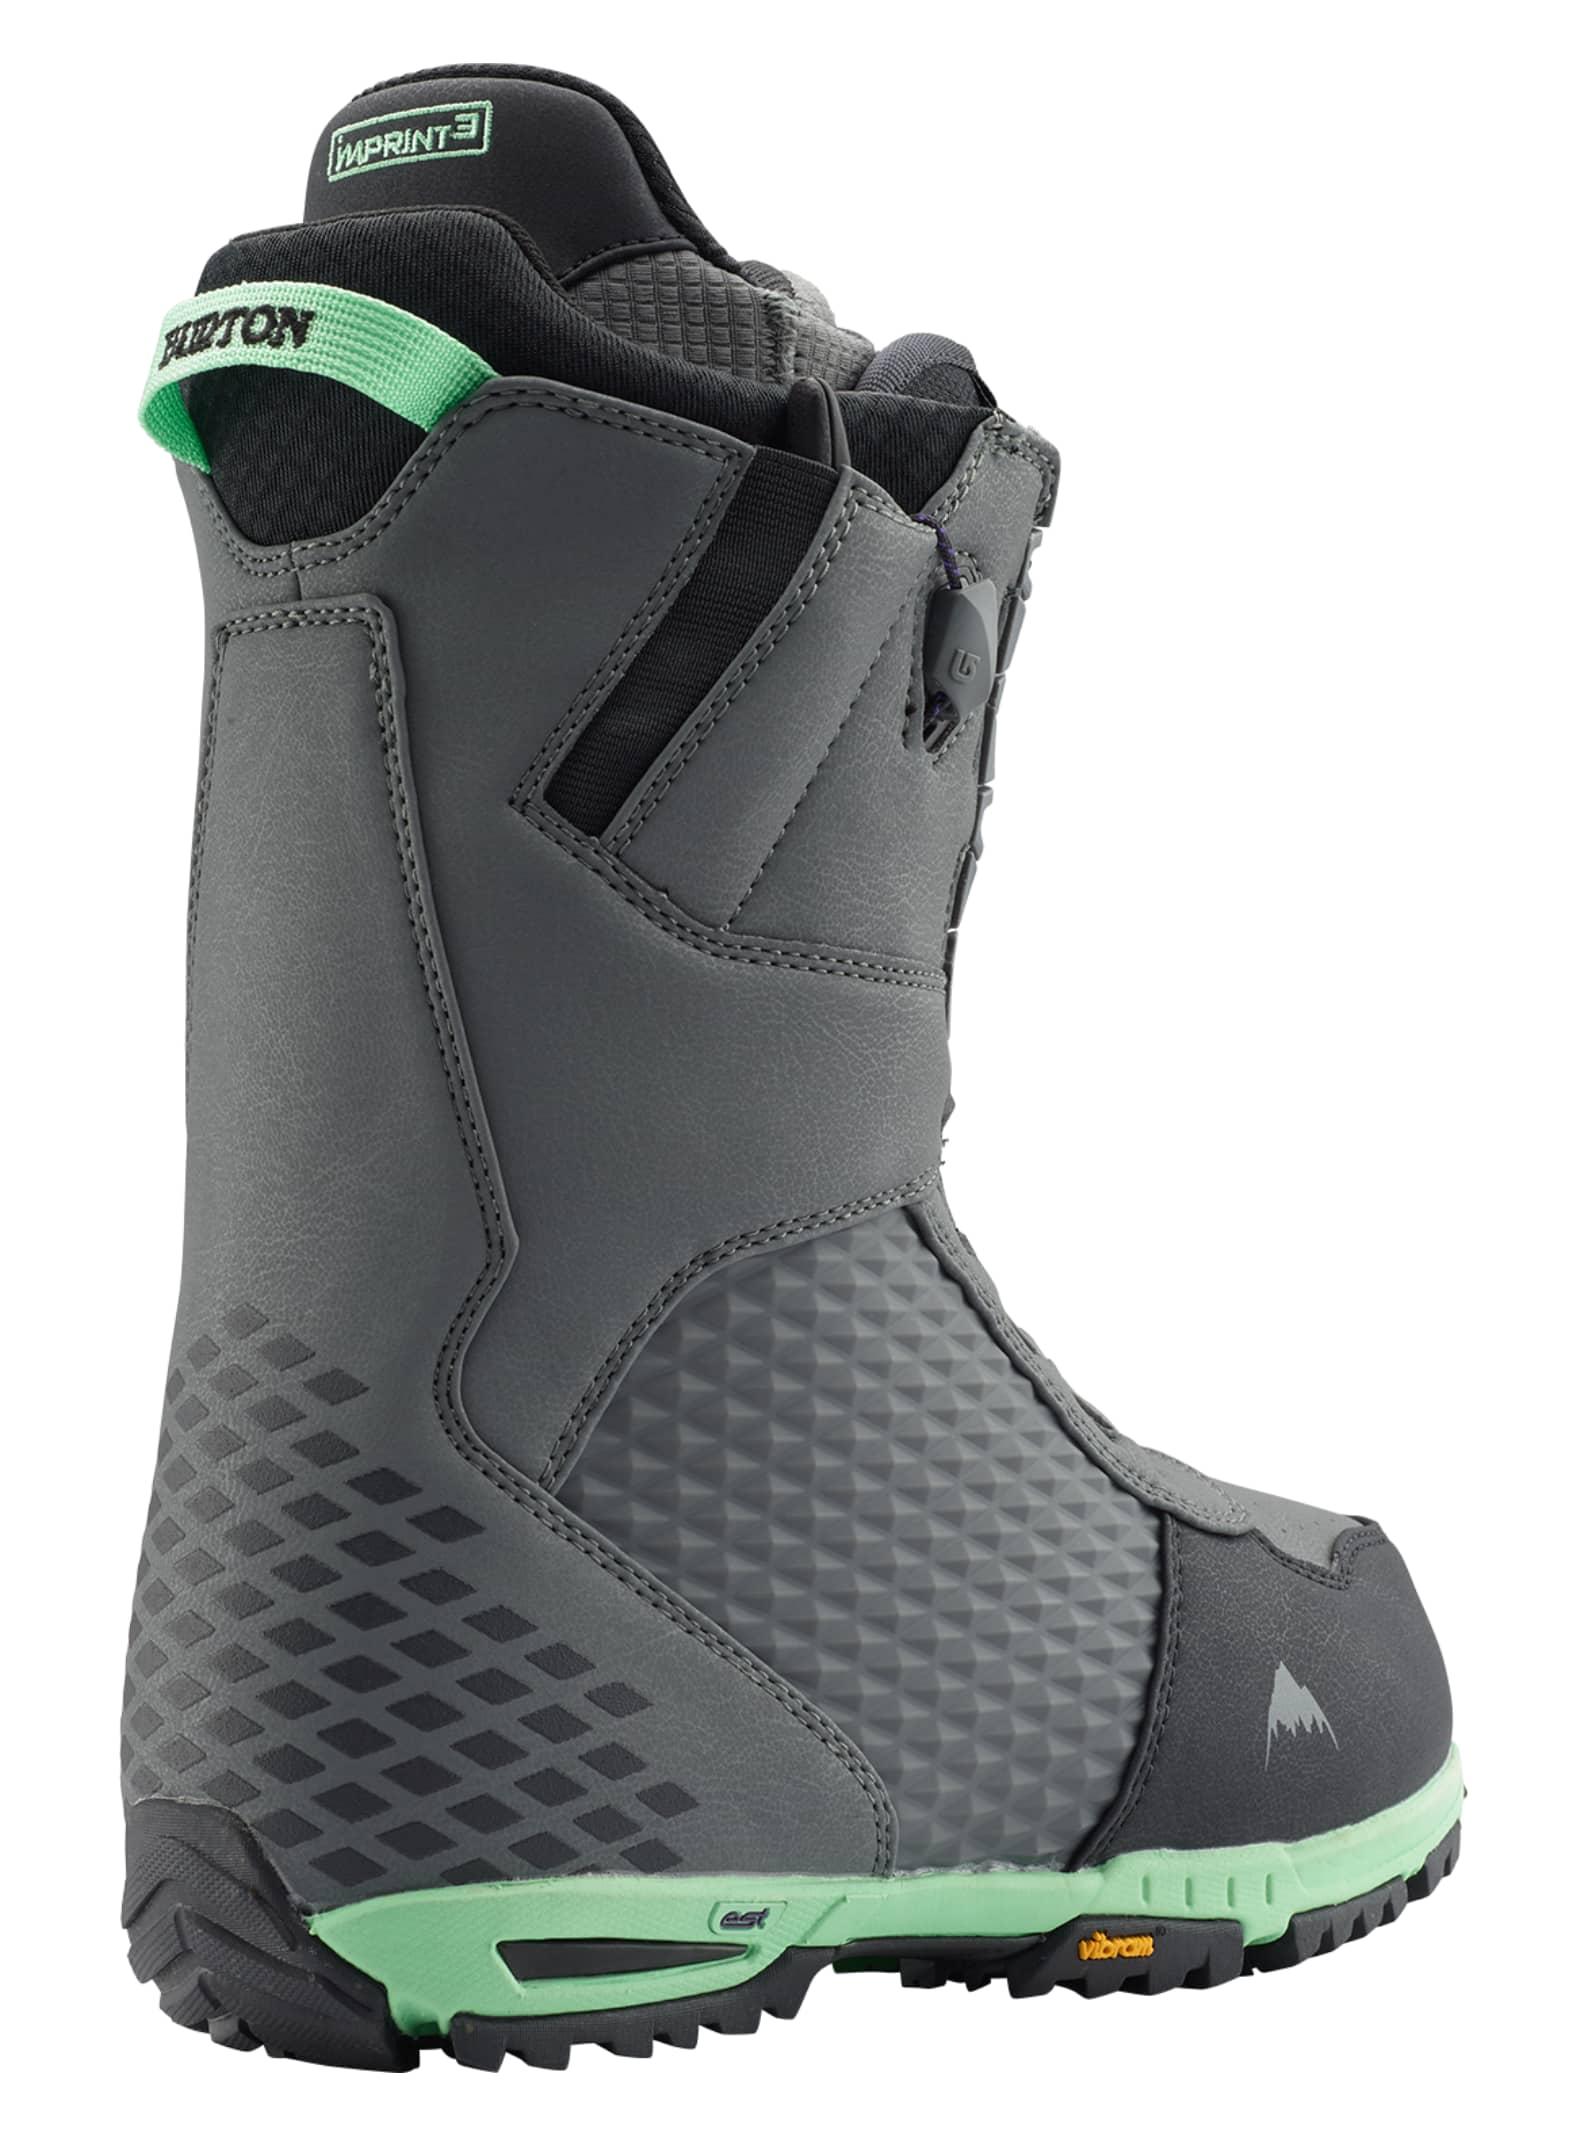 Men's Burton Imperial Snowboard Boot